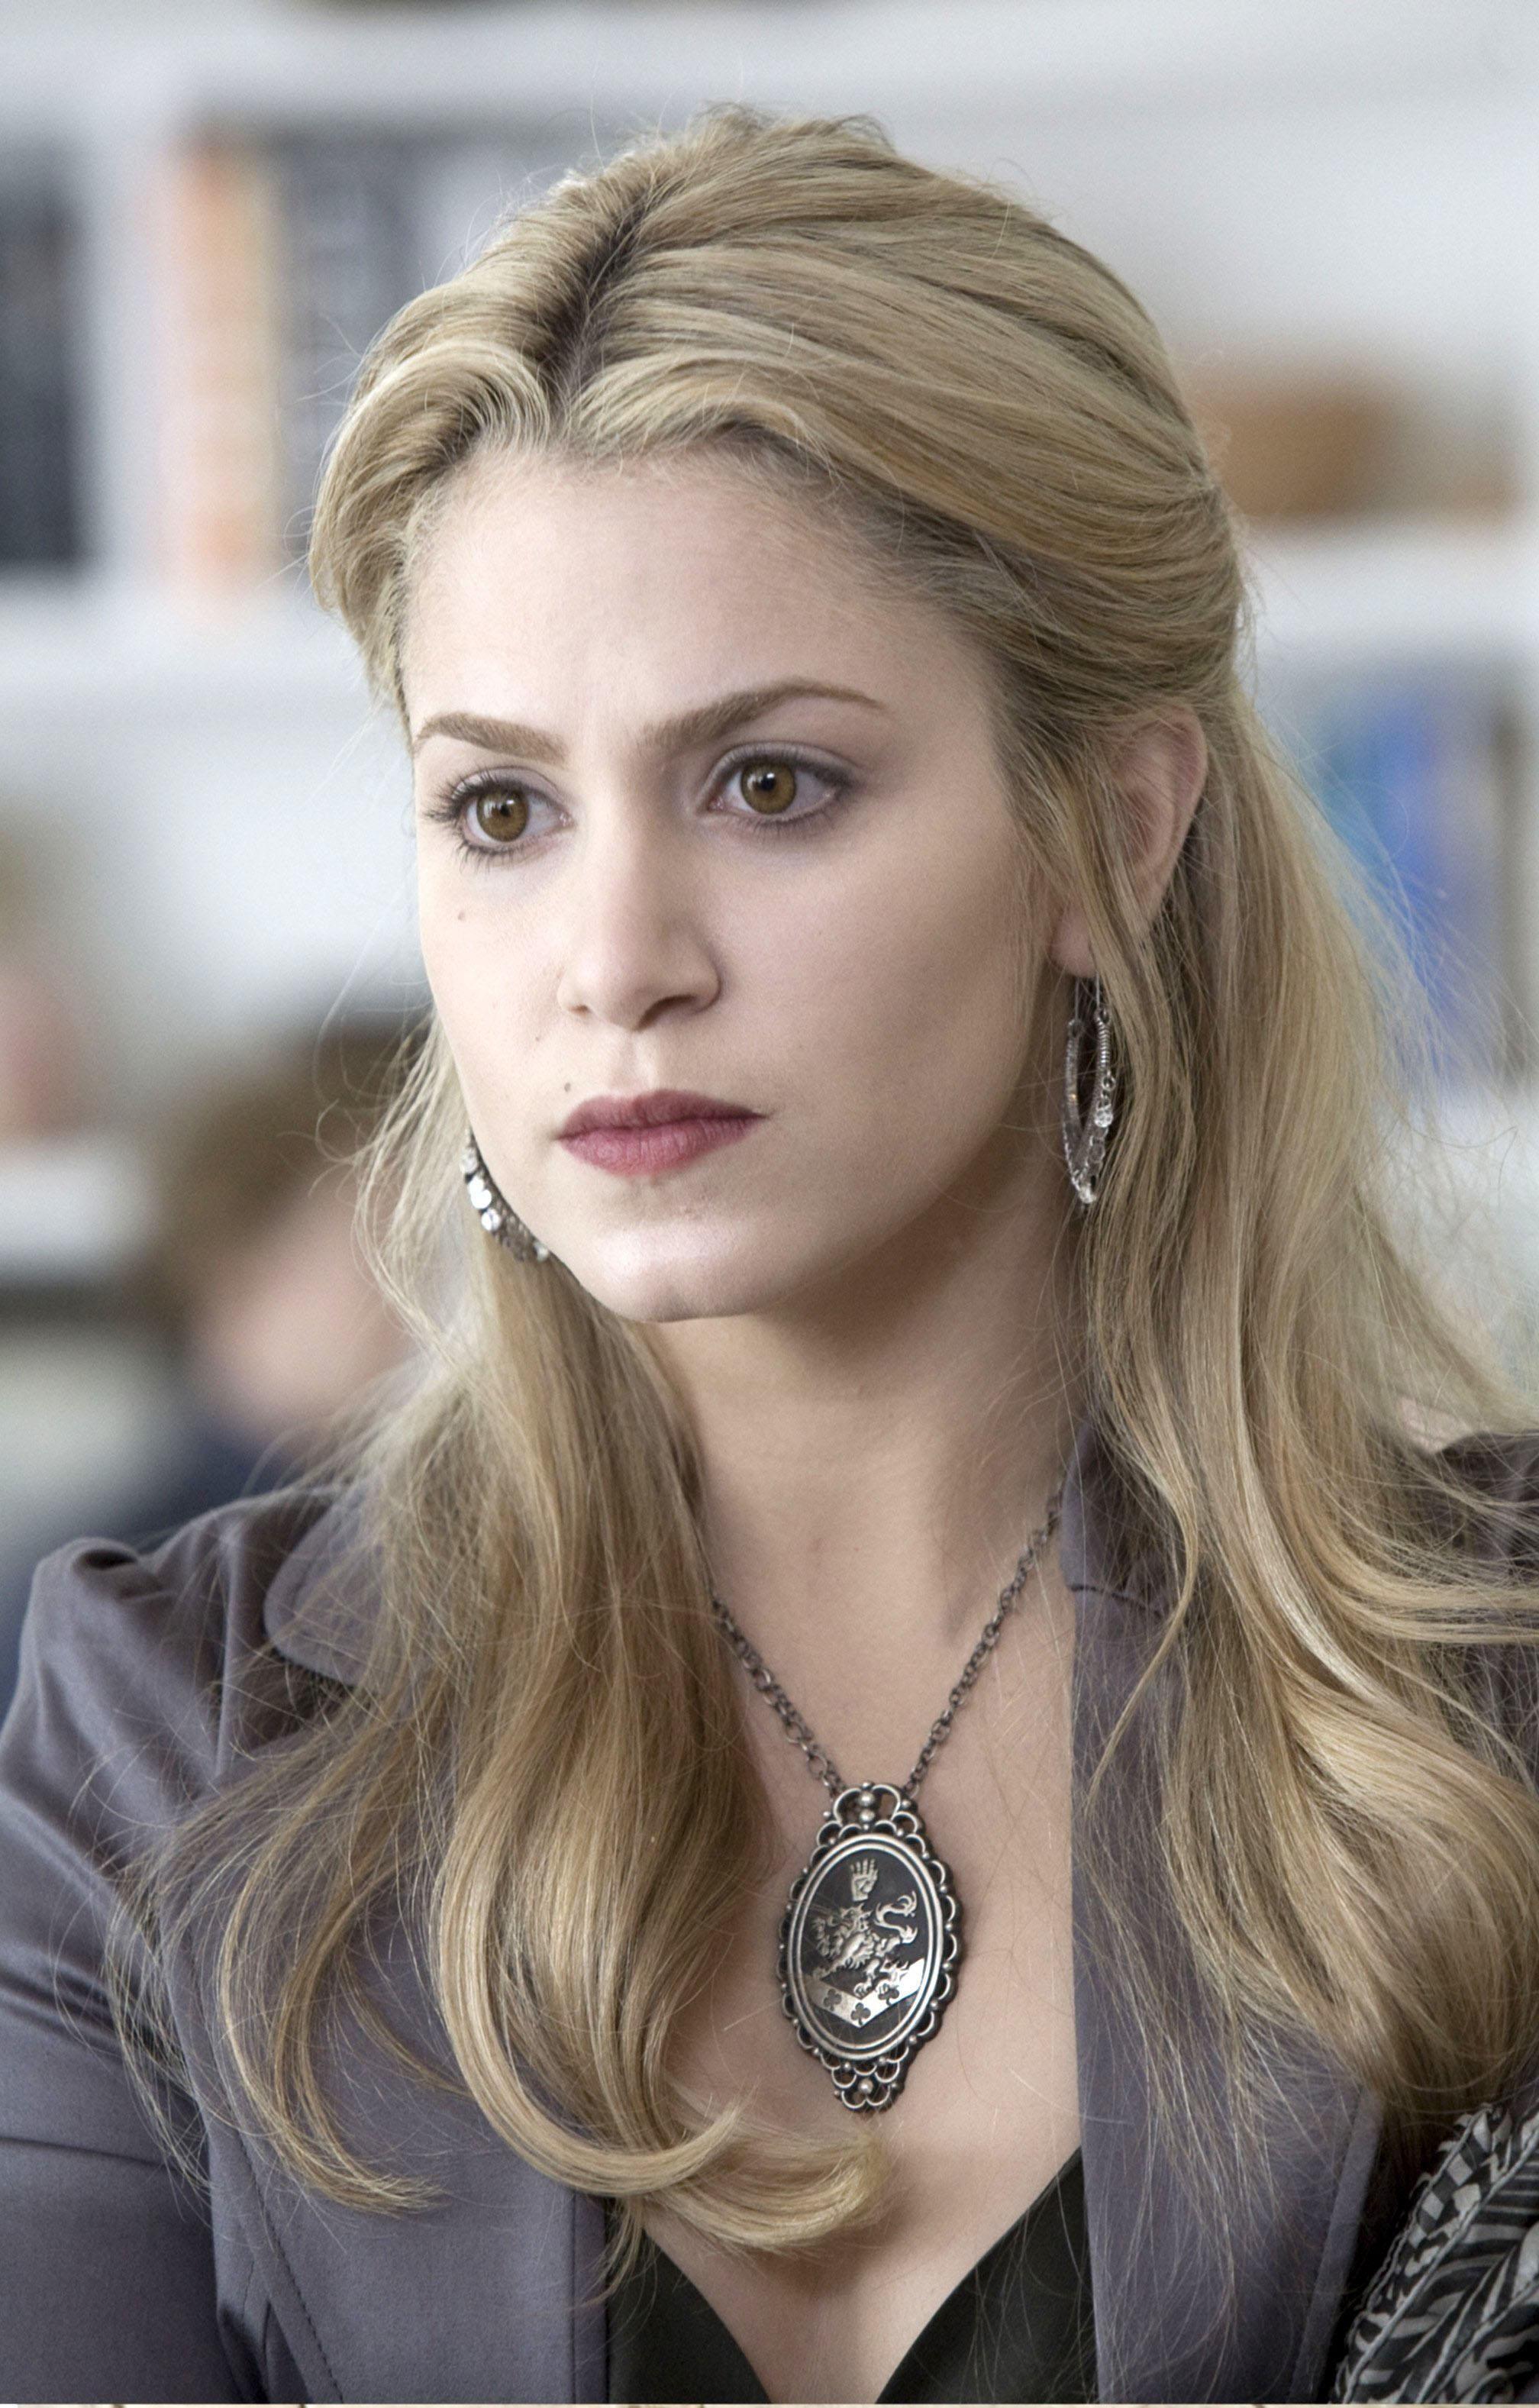 Nikki Reed Twilight As Kestrel Redfern In Daughters Of Darkness